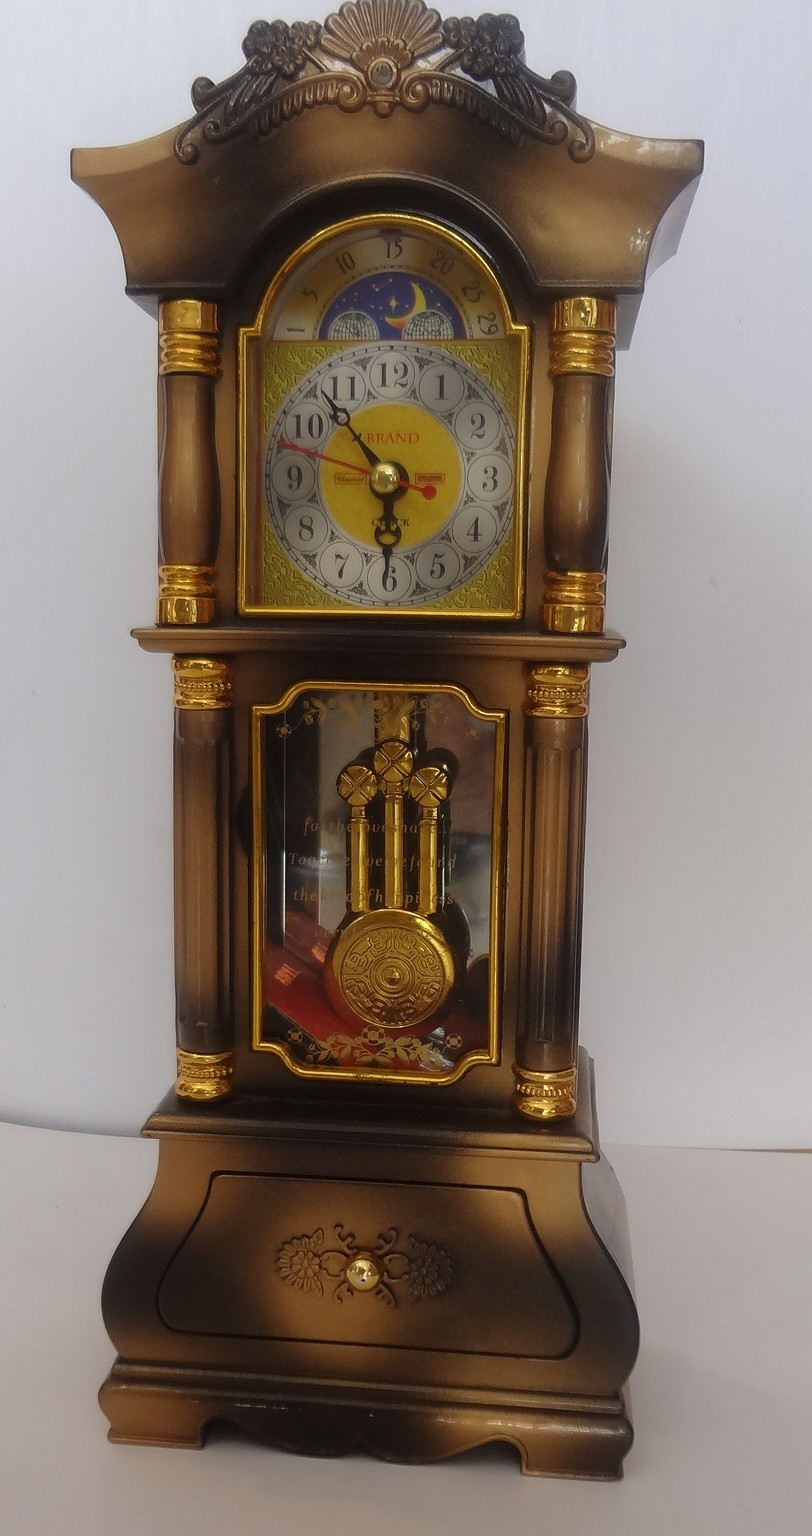 ساعت رومیزی پاندولی